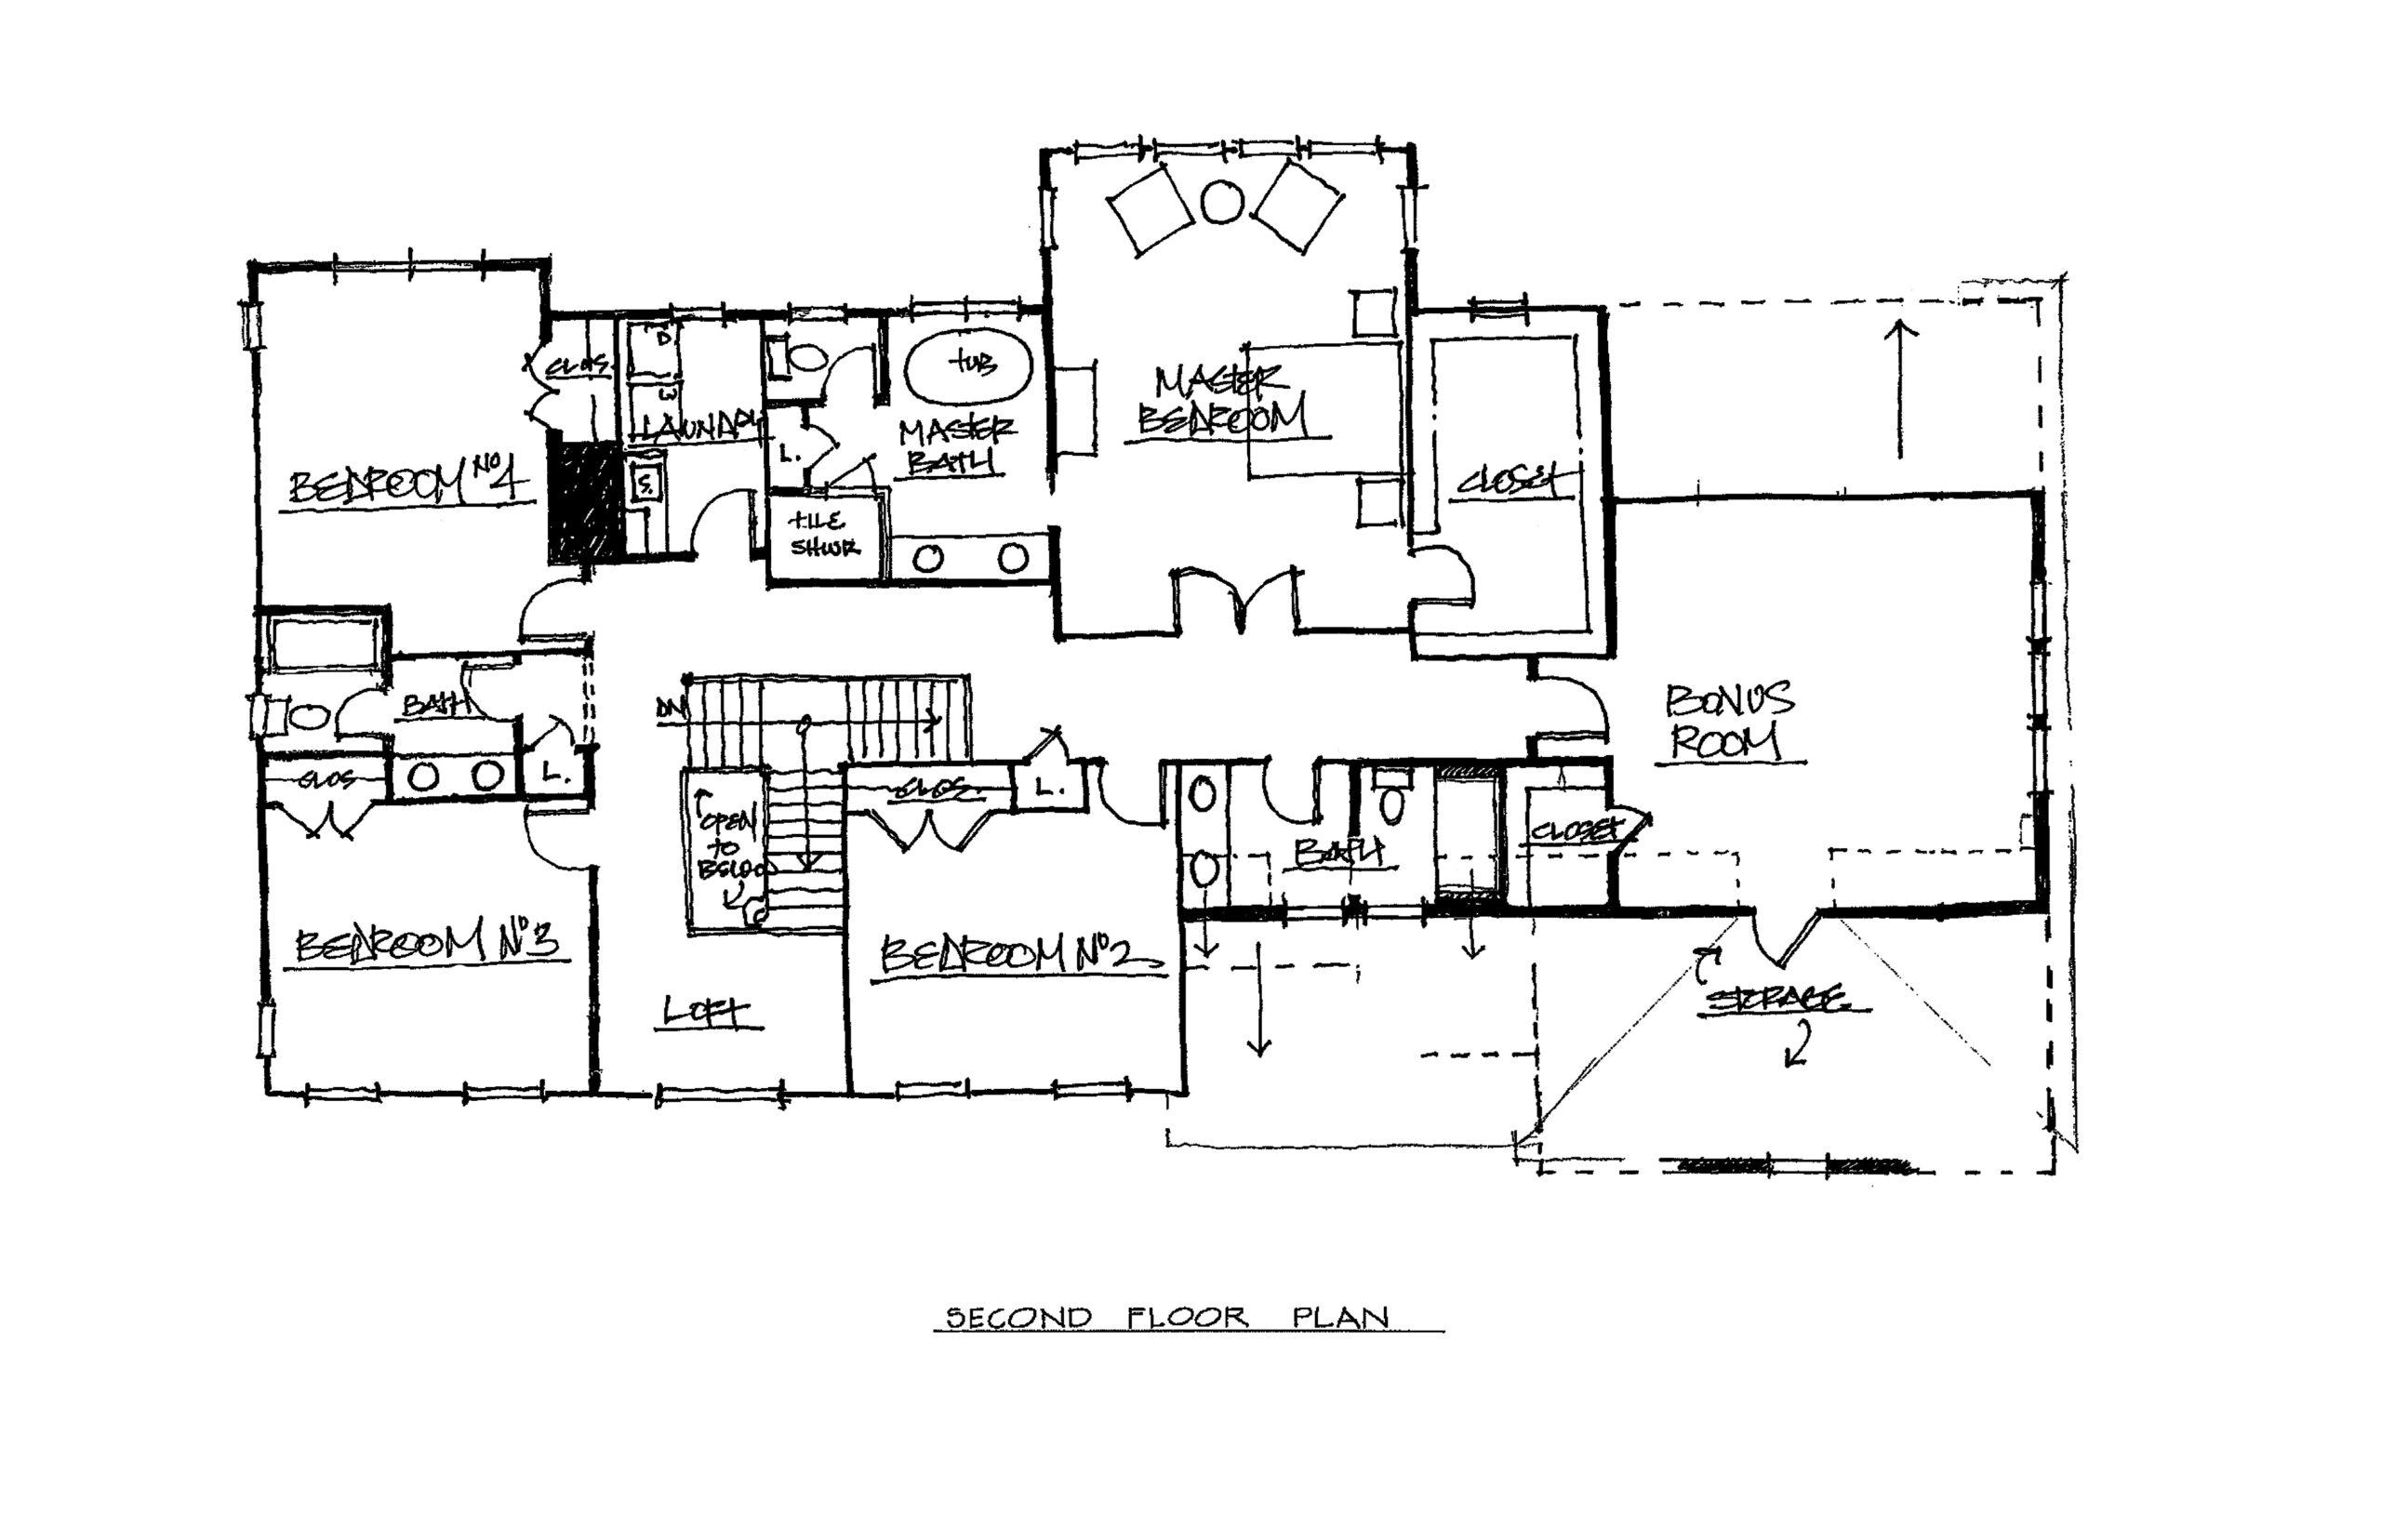 Stallion Ridge Homes | The Chevalier 4382 Sqft $1,101,500 2nd Floor